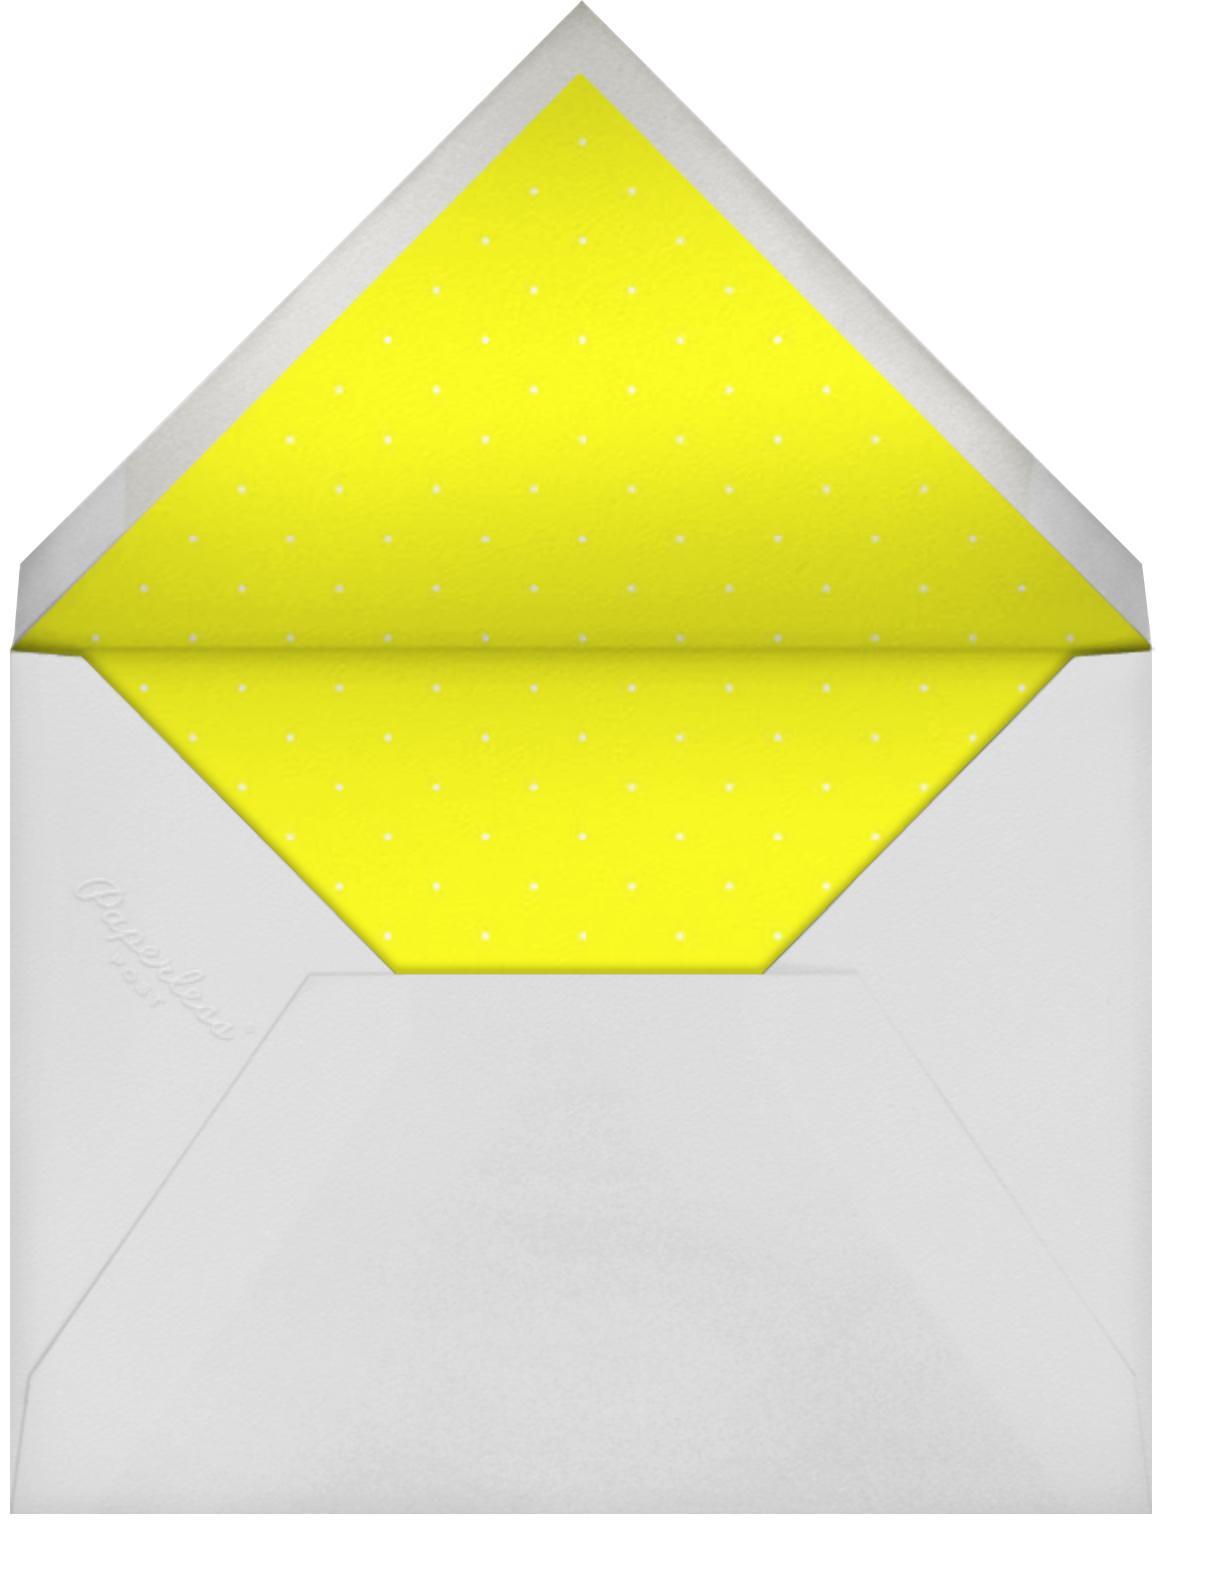 Spec in Capri - Sunshine - Mr. Boddington's Studio - Engagement party - envelope back